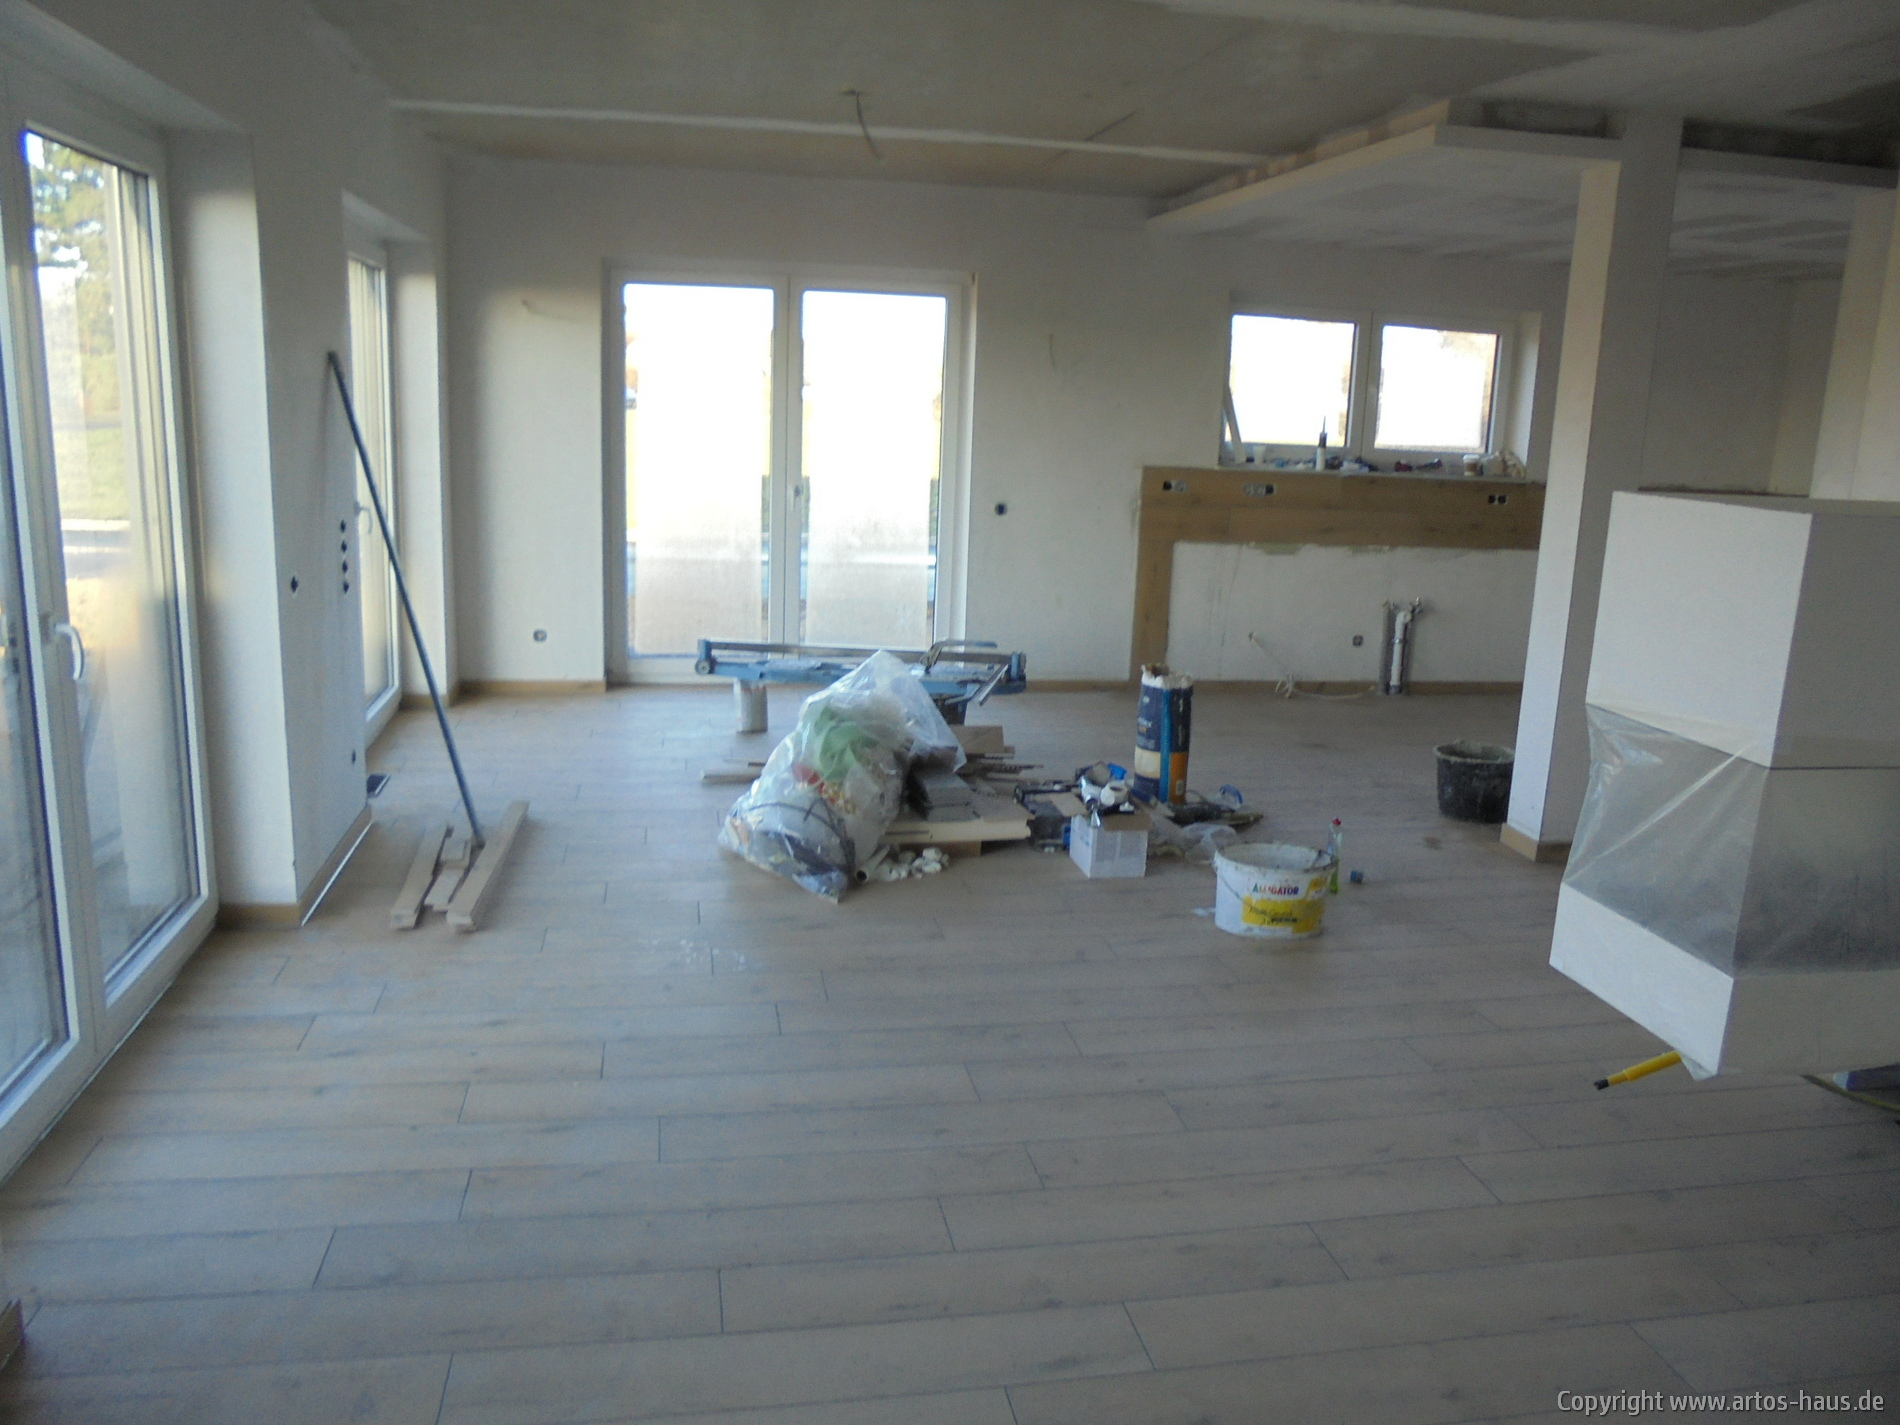 Fliesenarbeiten | Bauvorhaben www.artos-haus.de | Bild 2